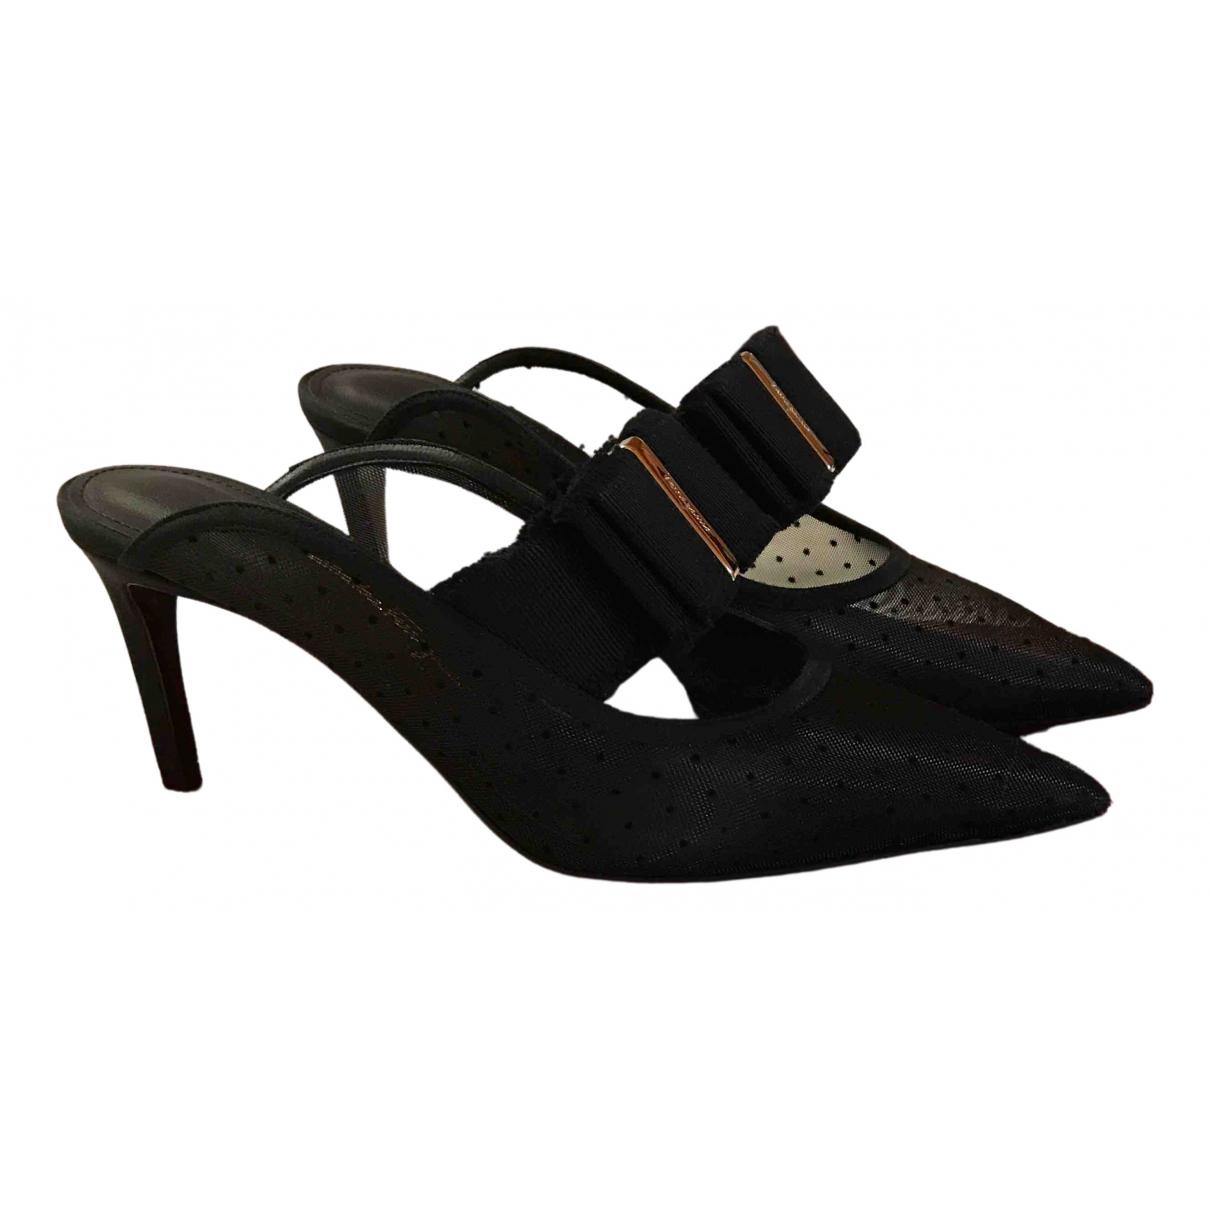 Salvatore Ferragamo \N Black Leather Sandals for Women 7 UK